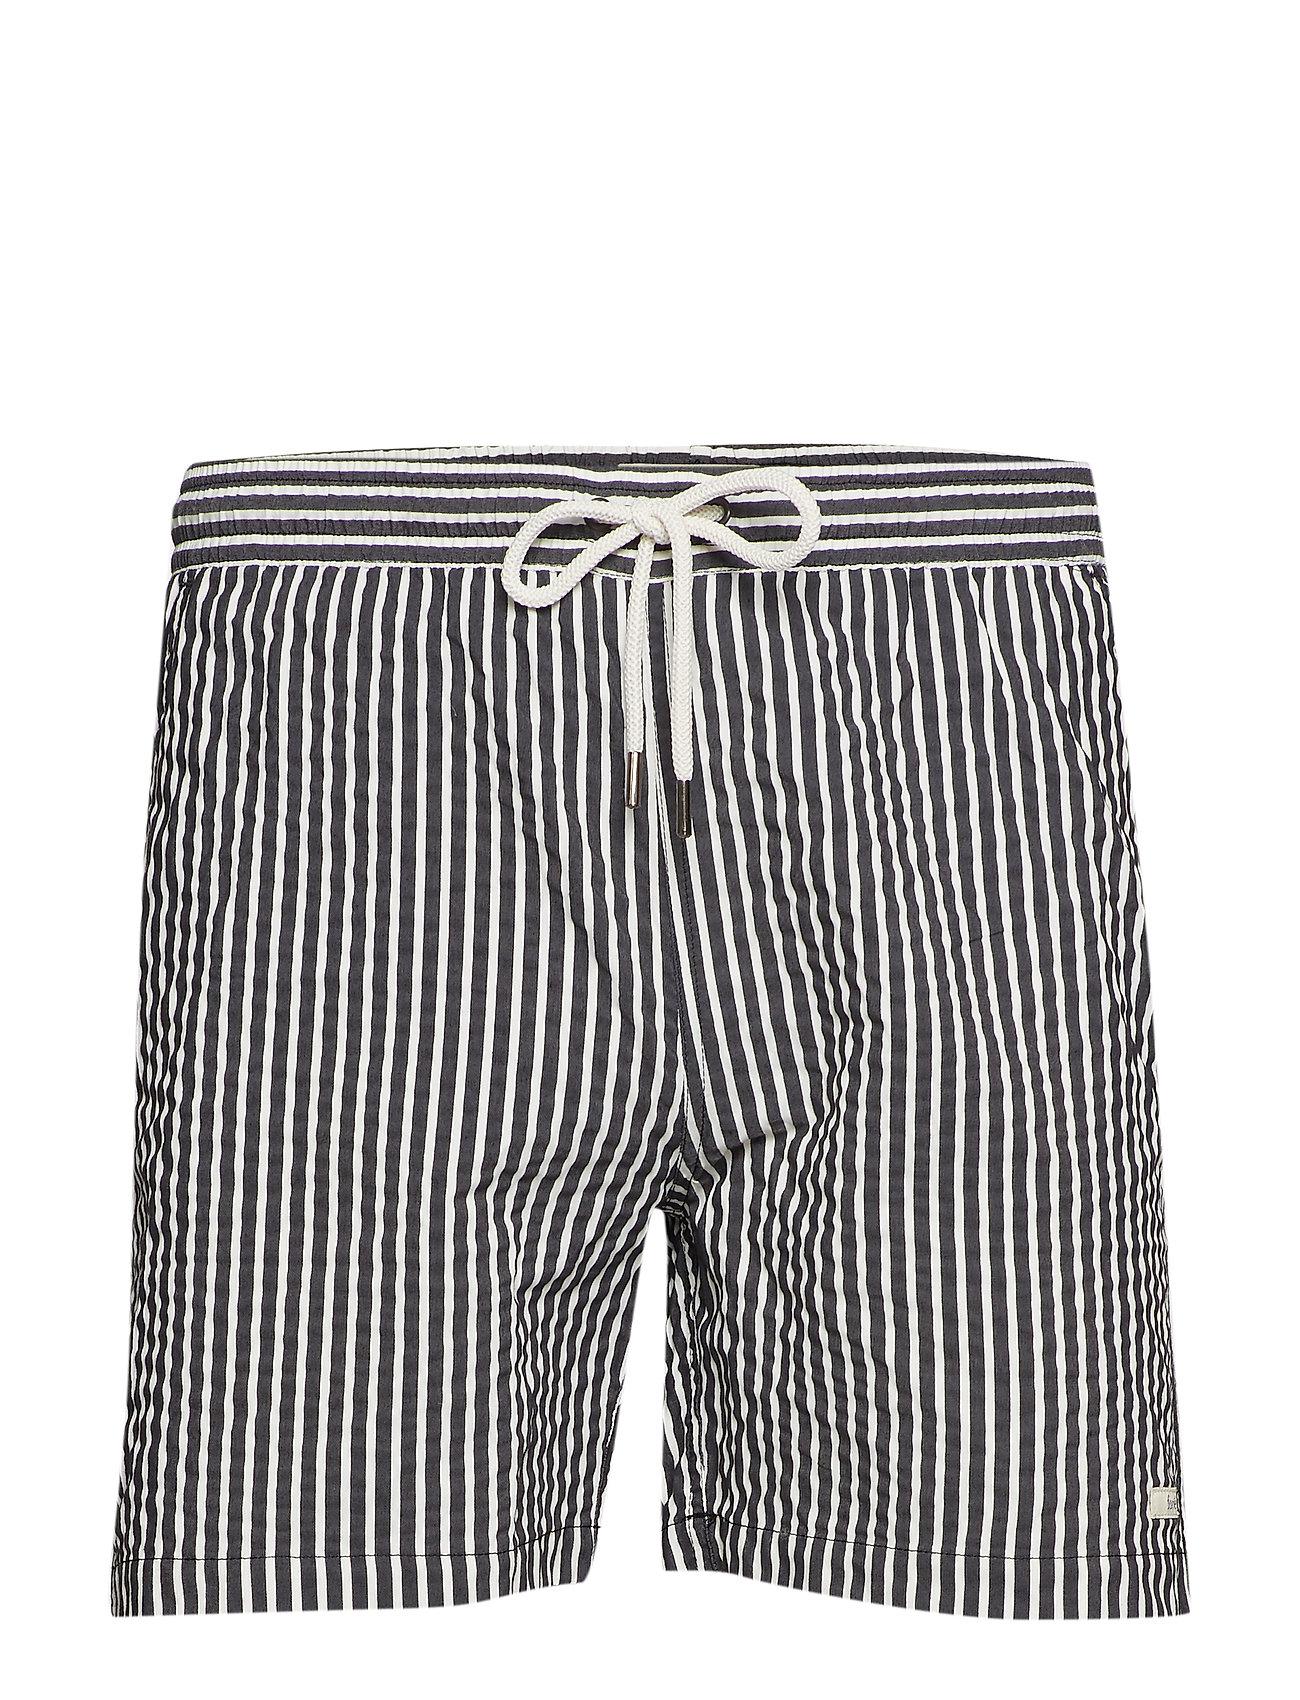 e3719f1904 Ocean Swim Shorts - Black/white (Black/white Striped) (£56) - Forét ...